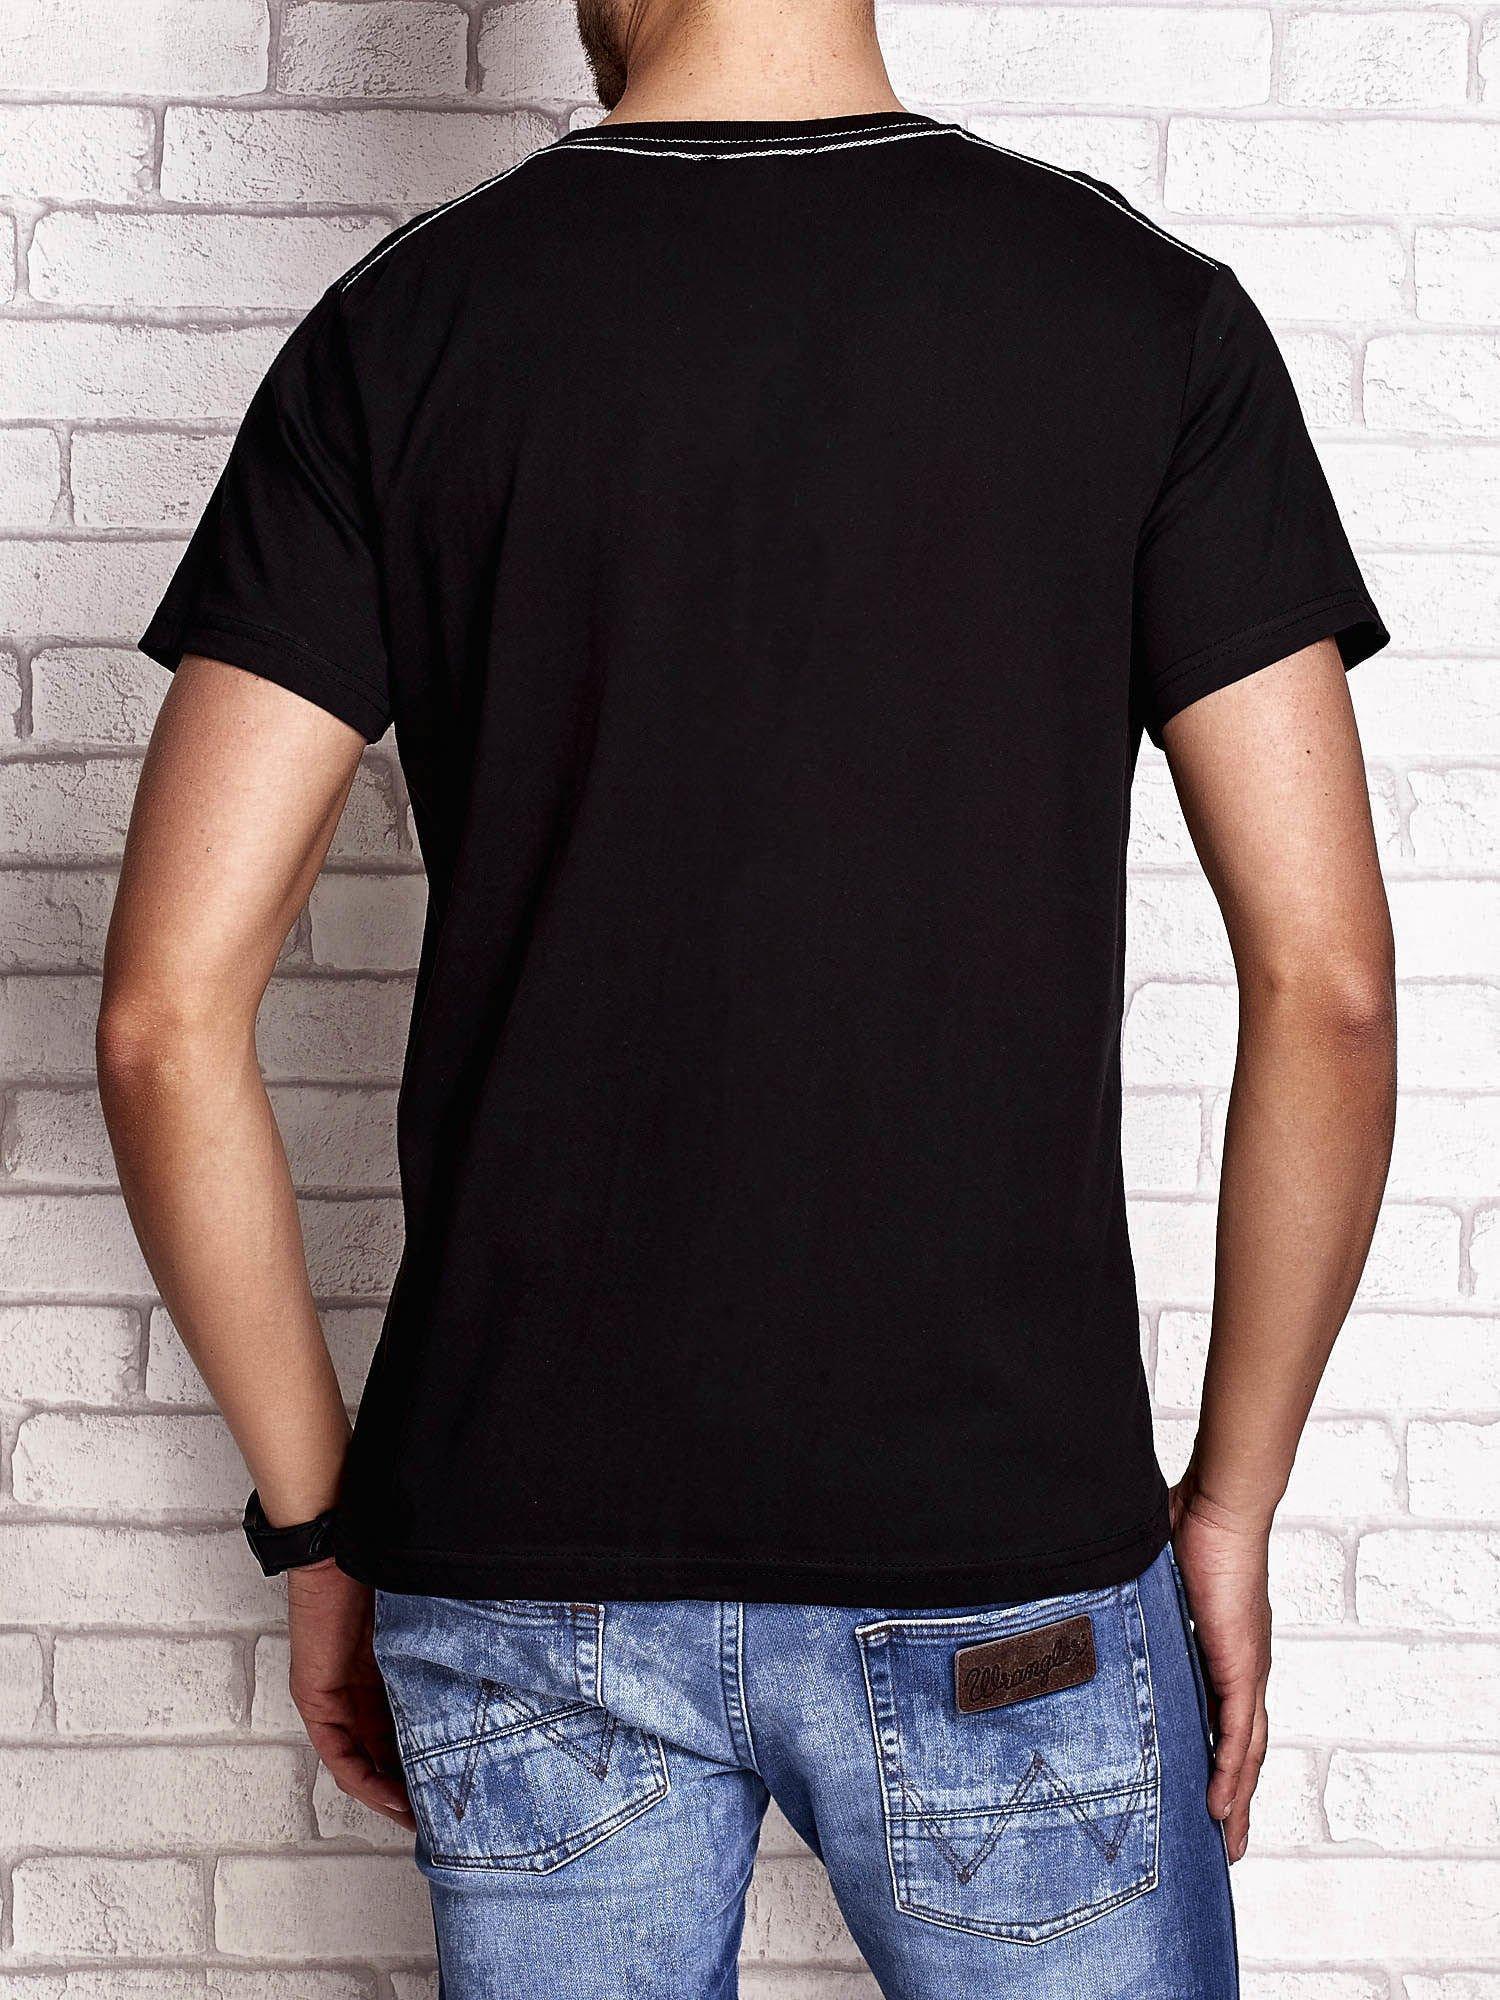 Czarny t-shirt męski z napisem BROOKLYN ATHLETIC UNIVERSITY                                  zdj.                                  2